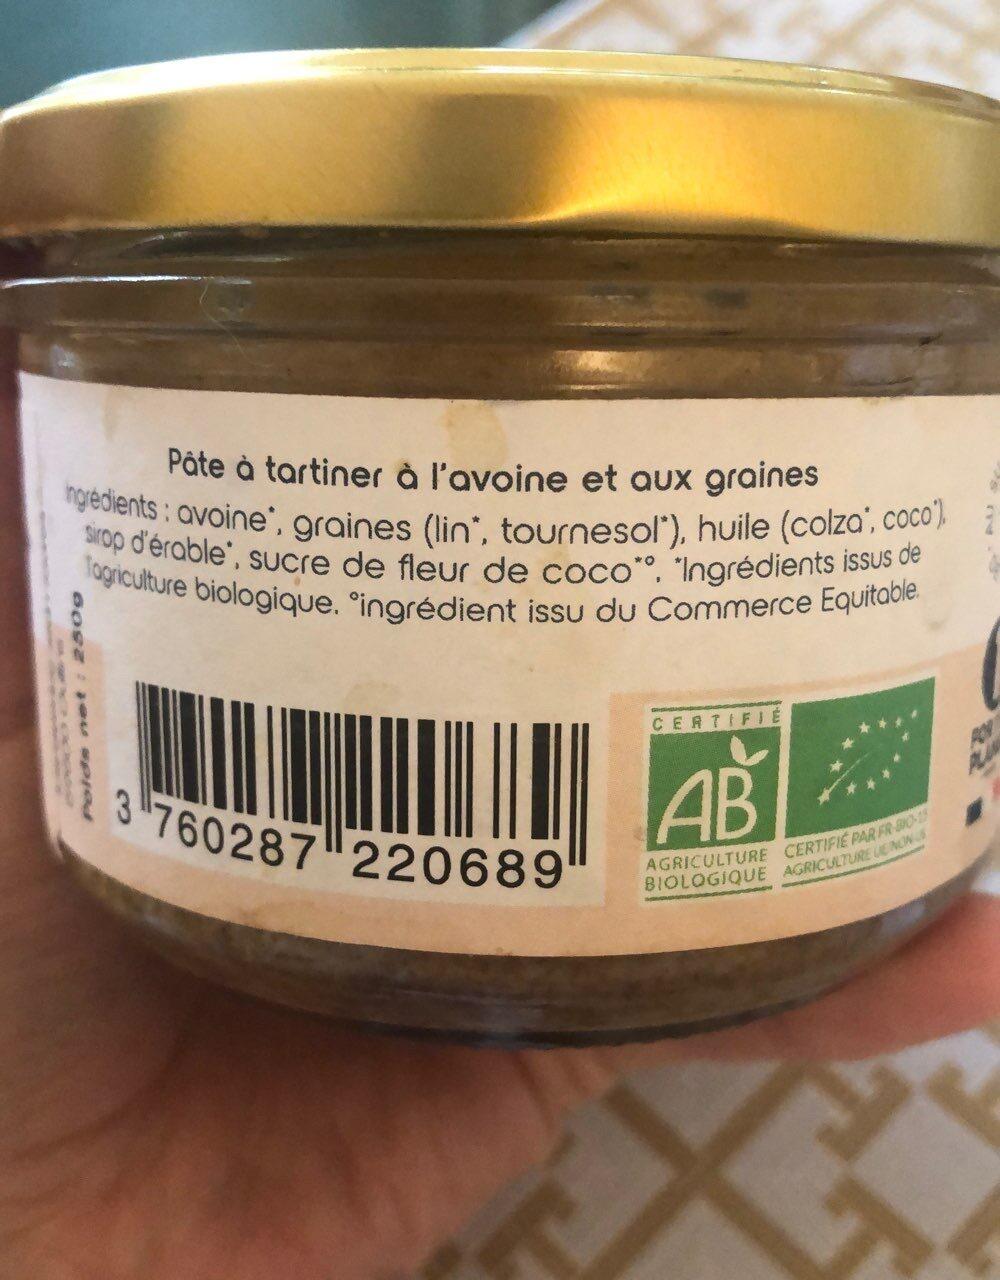 Pâte à tartiner au granola - Ingrédients - fr